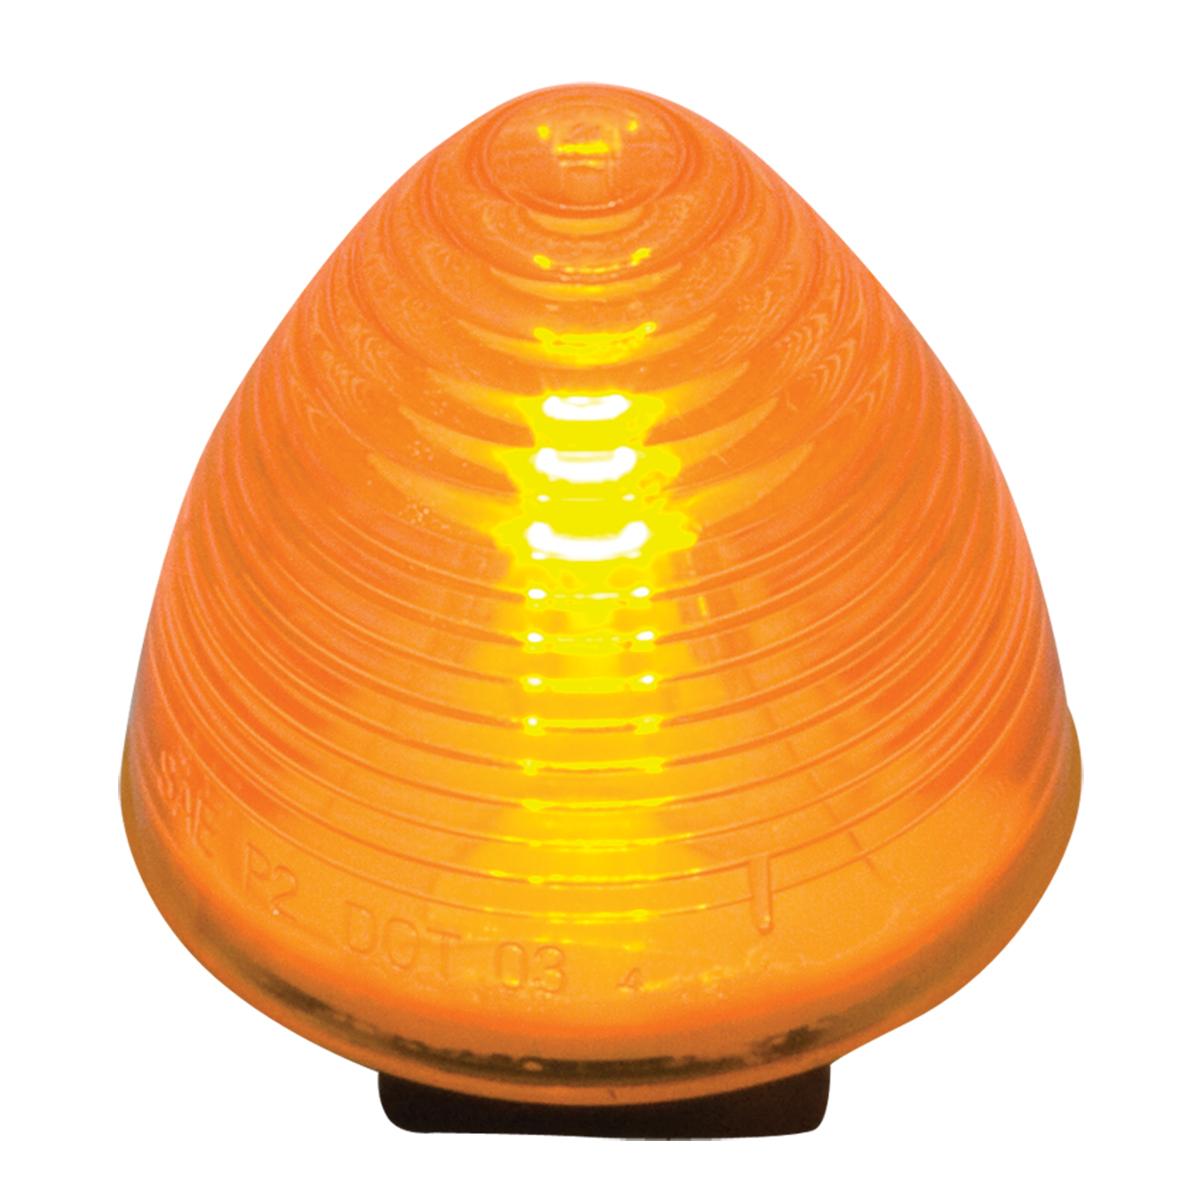 "#80942 2"" Beehive Incandescent Flat Amber/Amber Light"